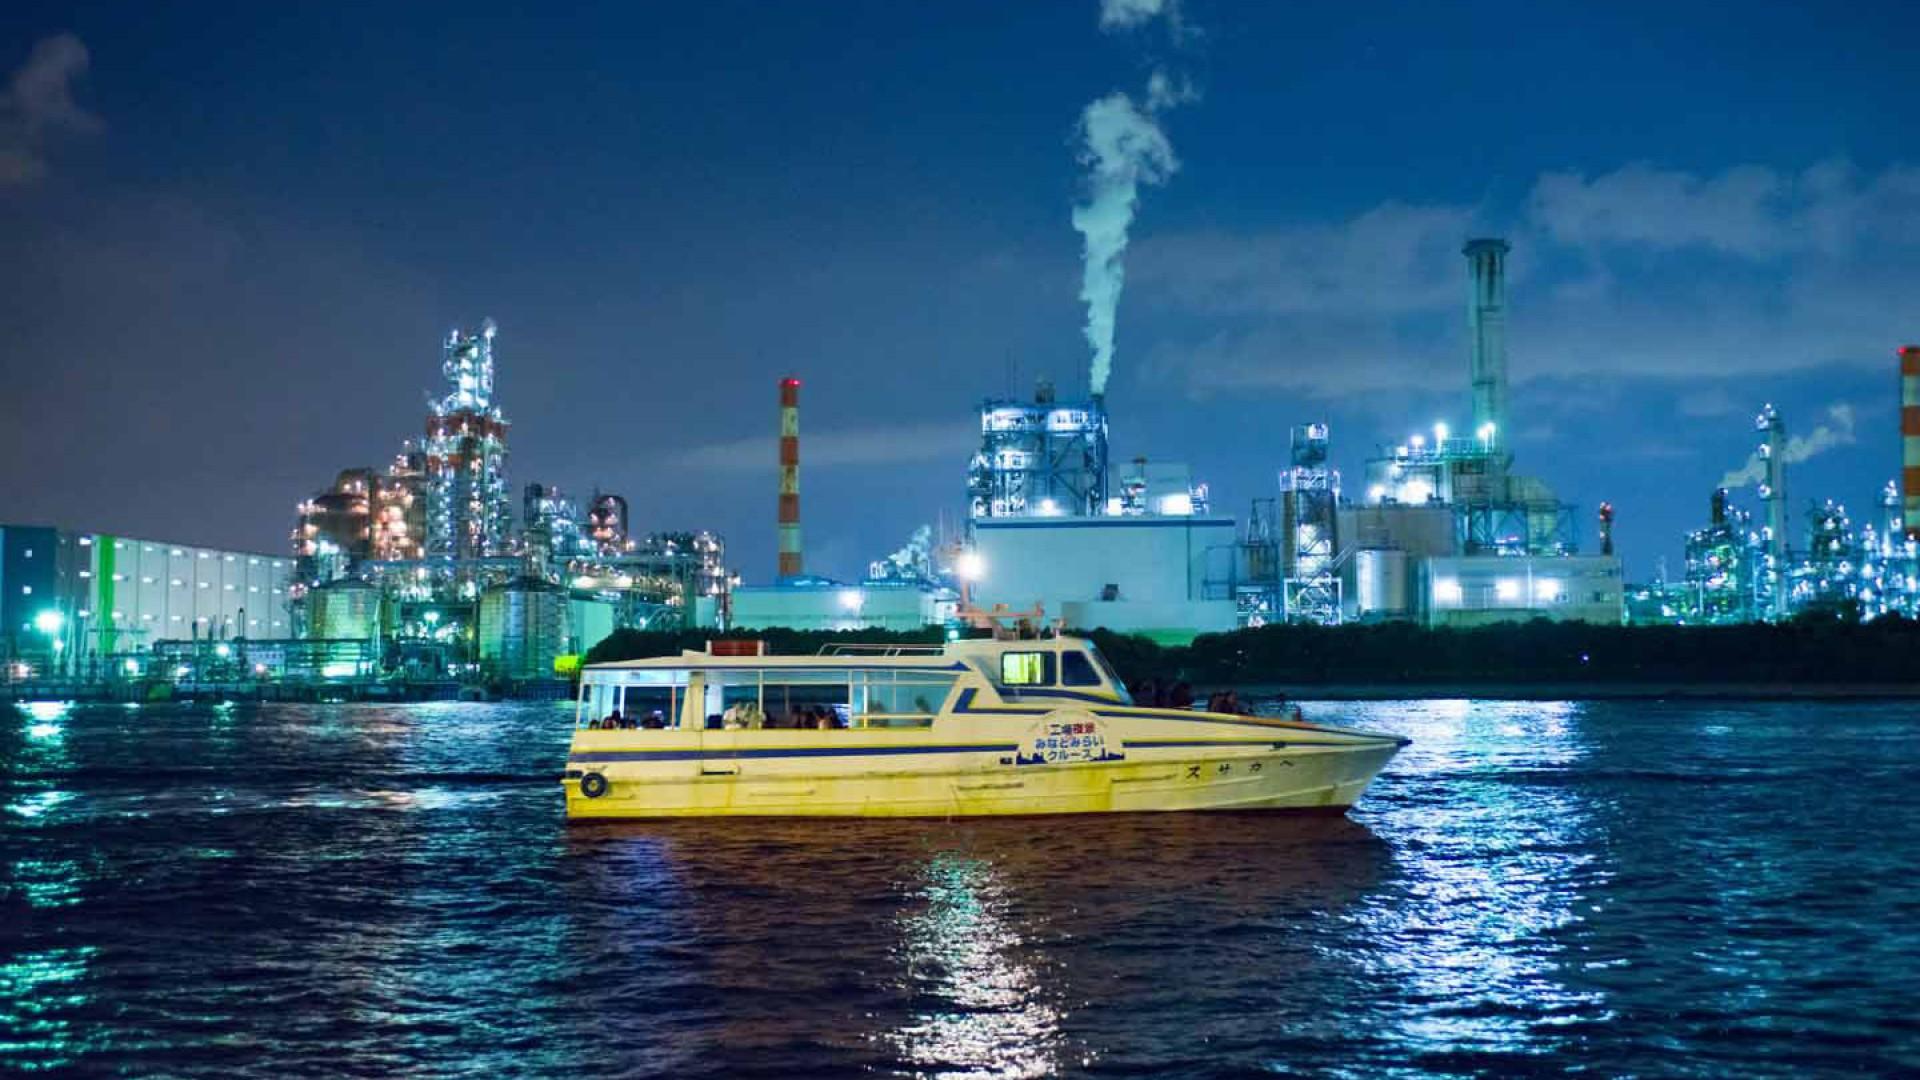 Keihin Fabrik Ansicht bei Nacht und Minato Mirai Kreuzfahrt